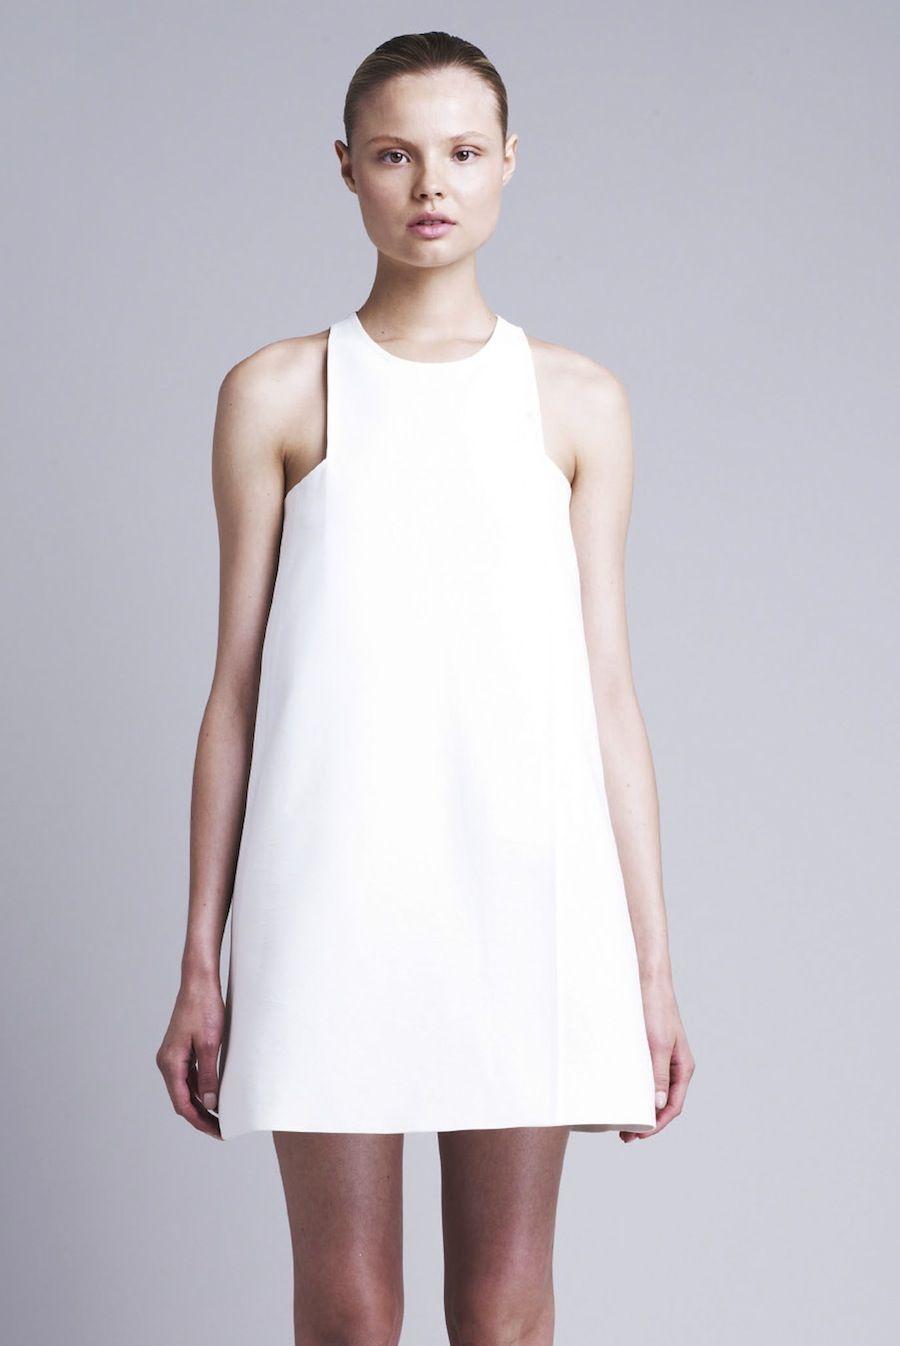 chic white dress minimal fashion modern simplicity stella mccartney minimalism. Black Bedroom Furniture Sets. Home Design Ideas